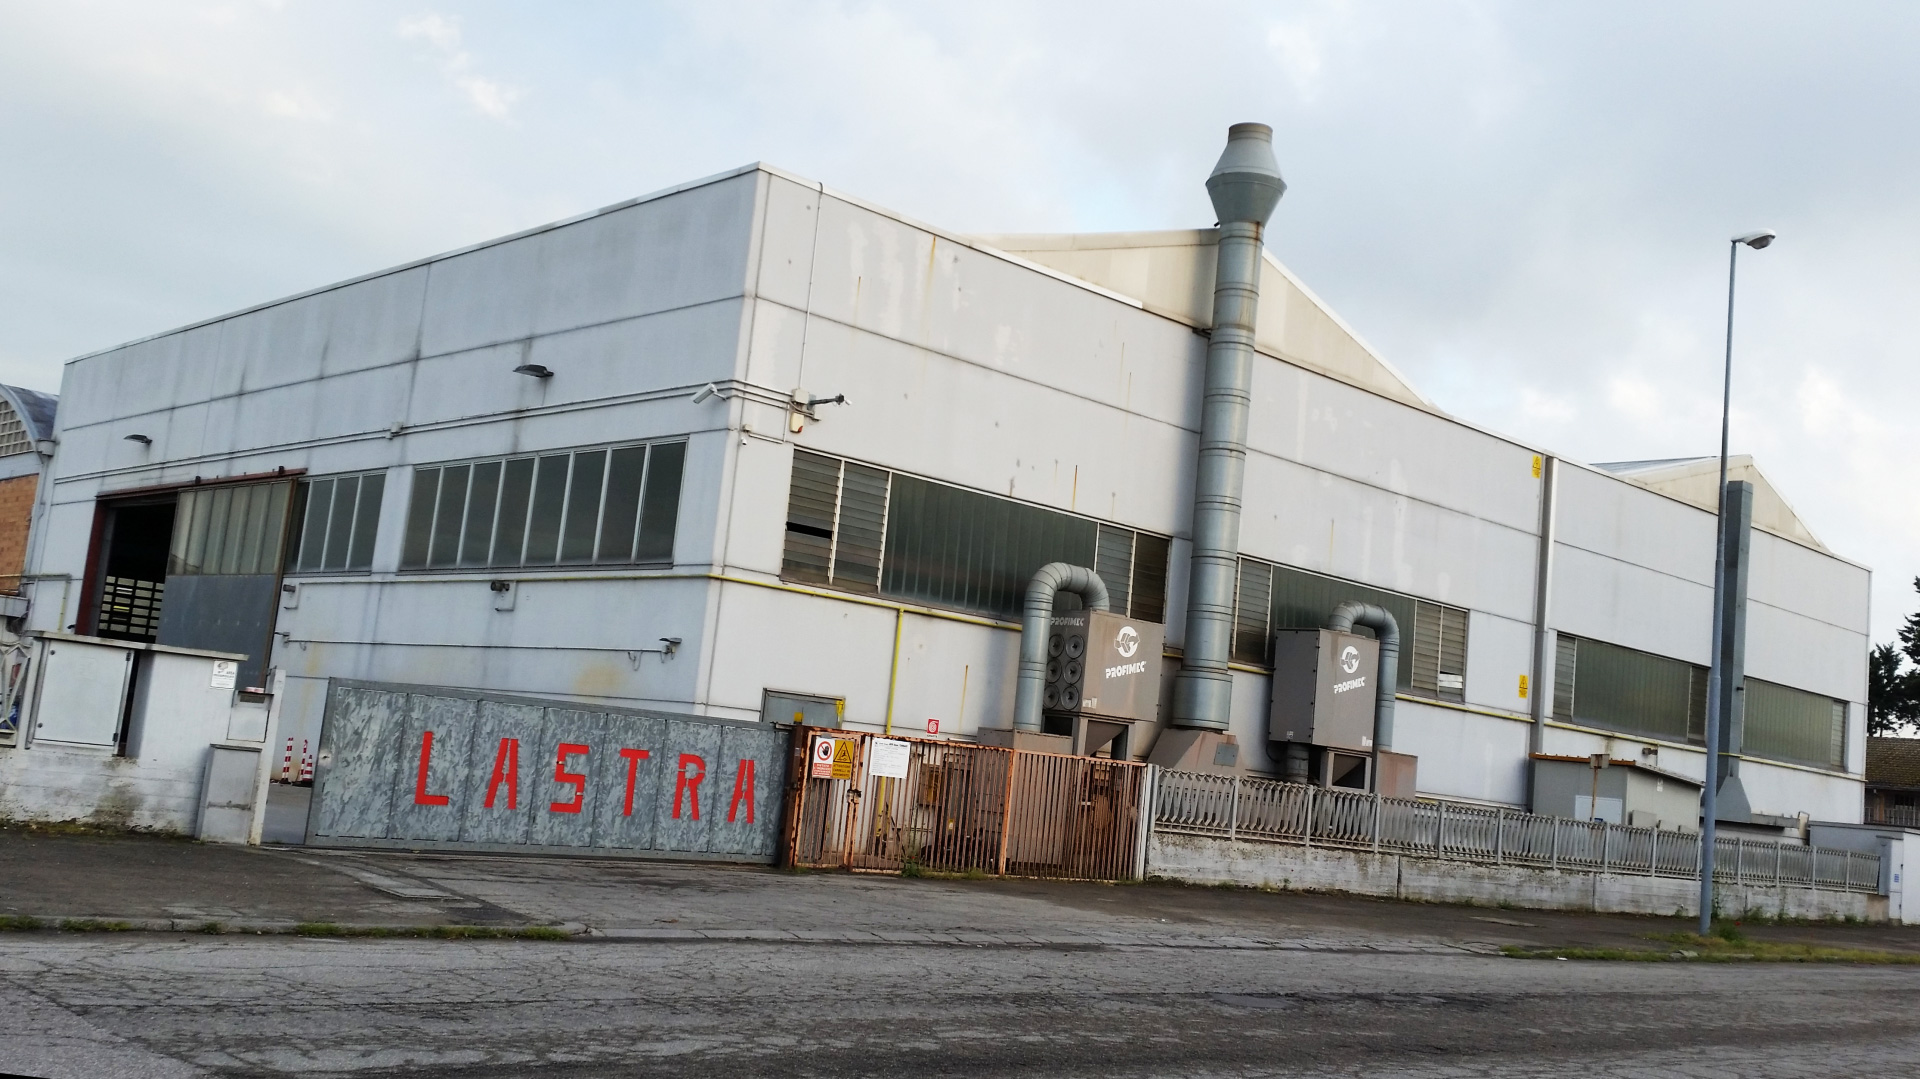 Lastra - Sede produttiva Ravenna (Zona Bassette)